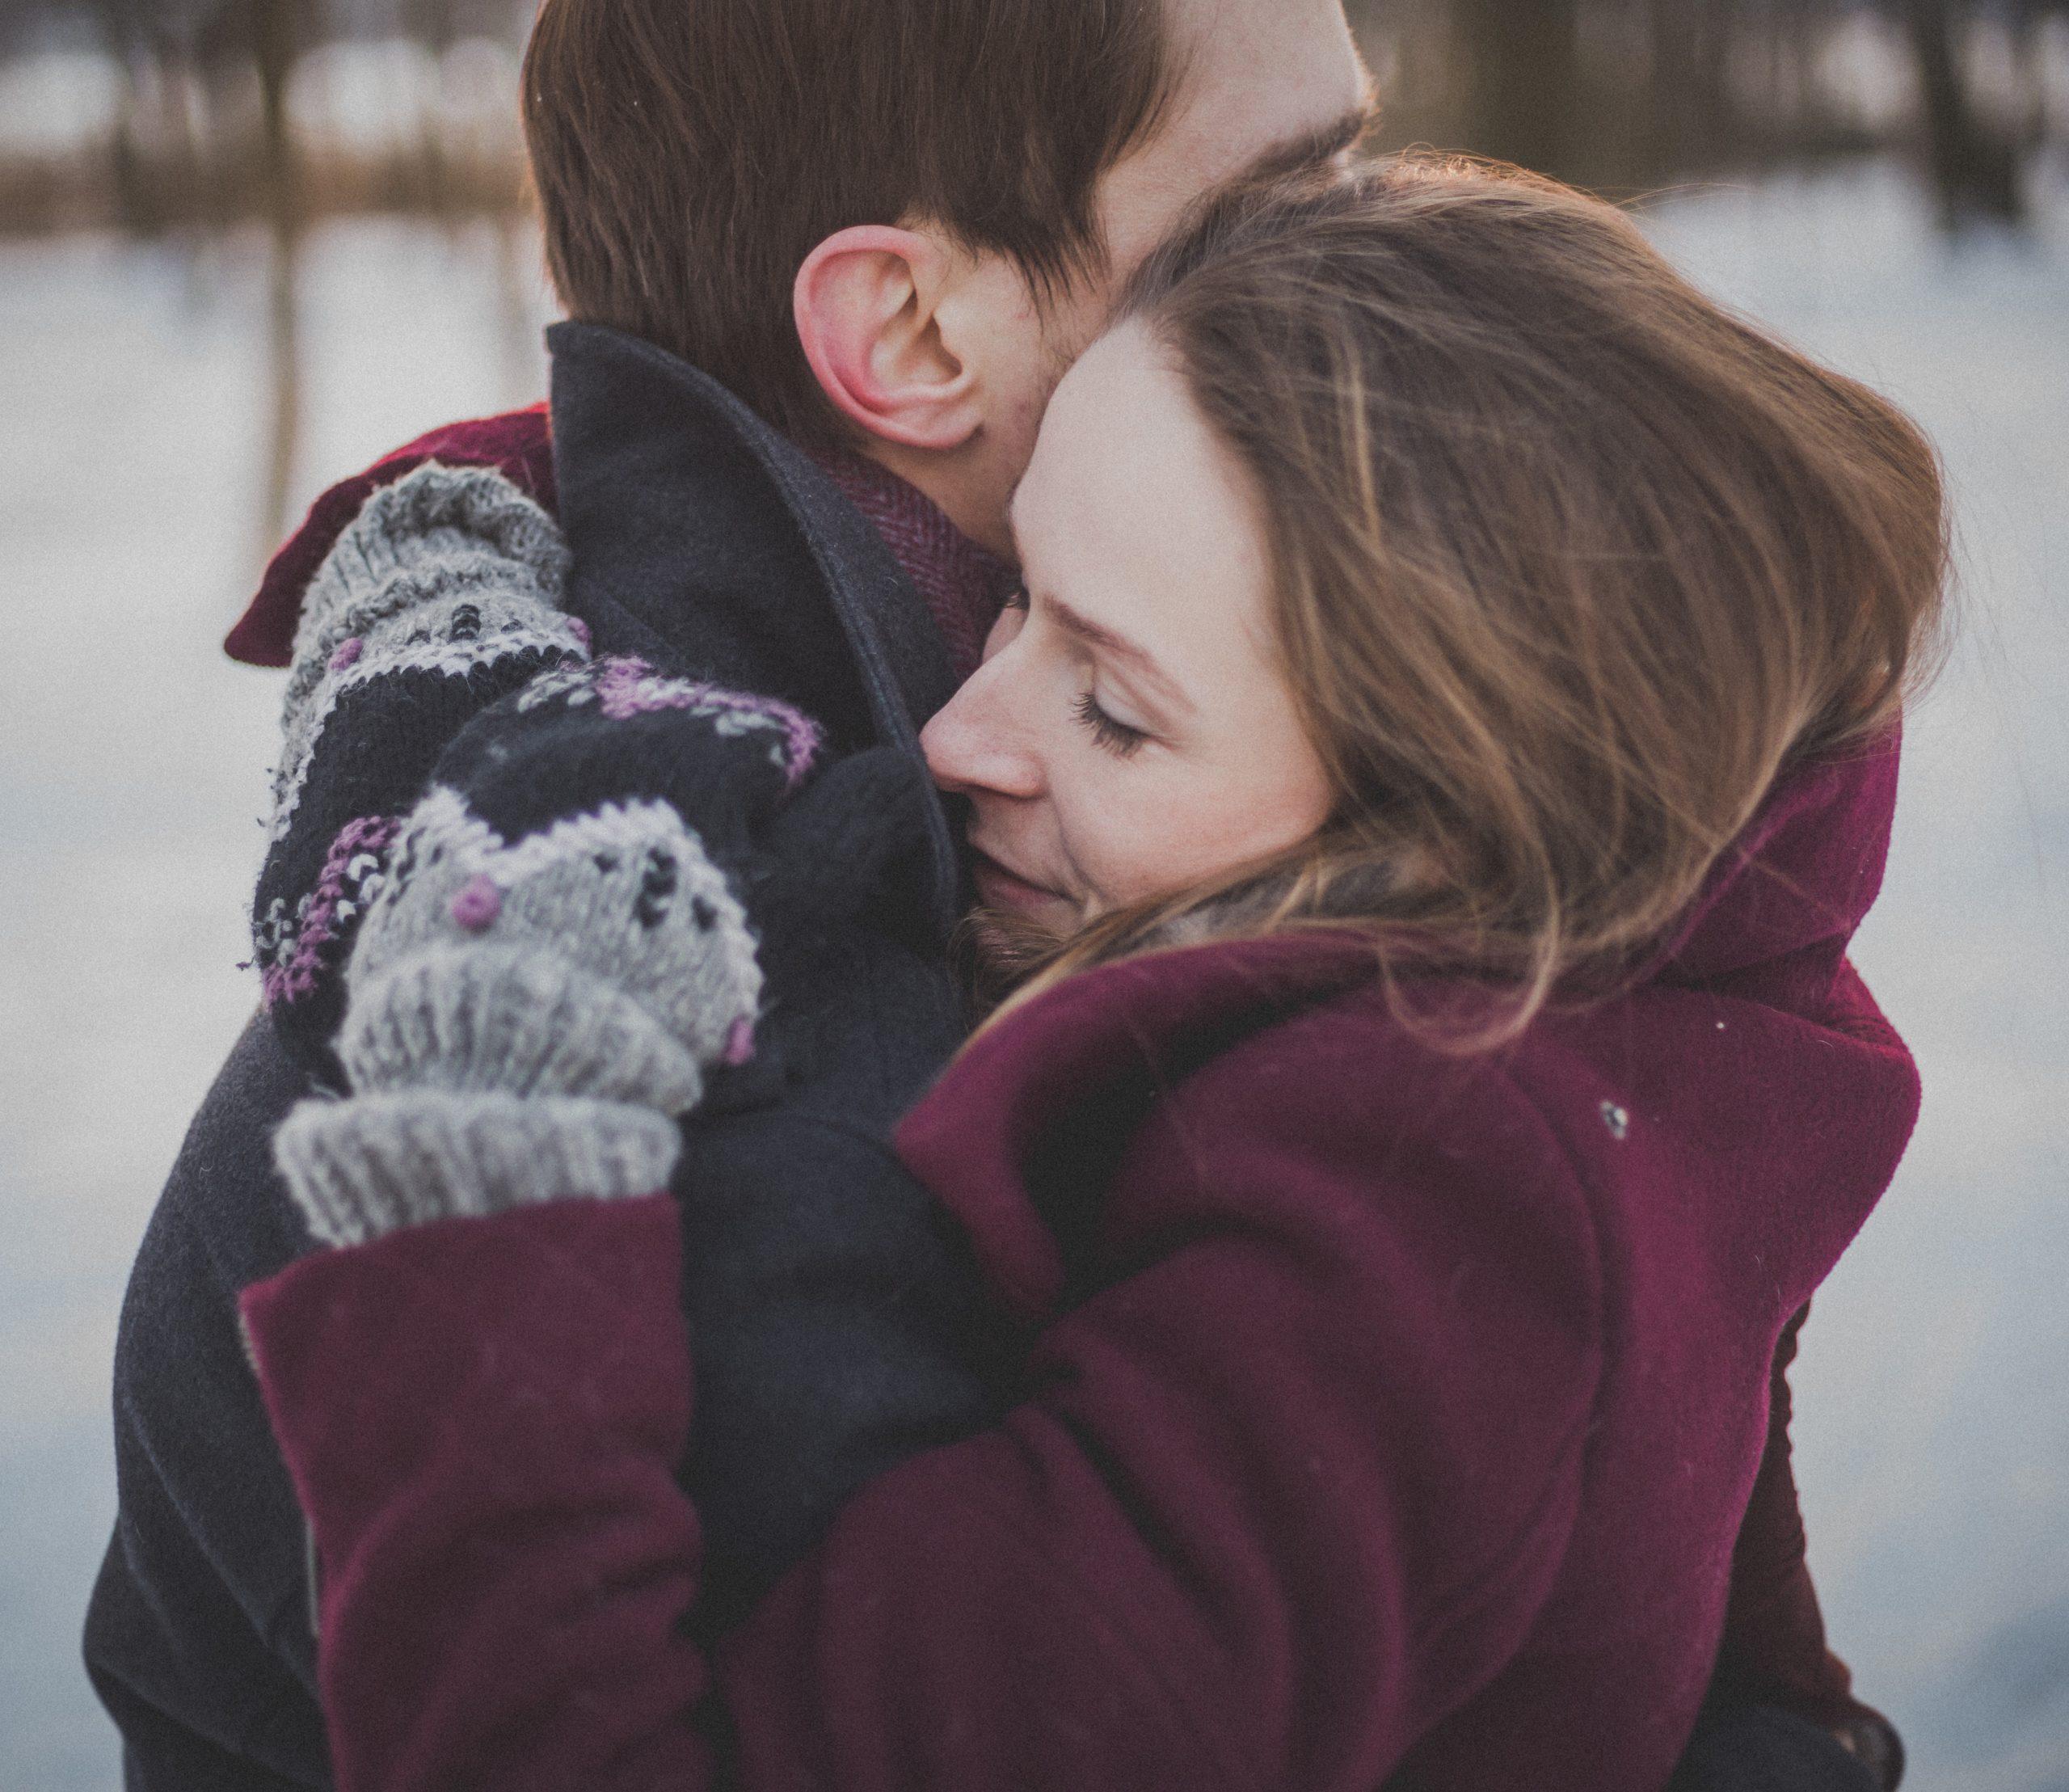 صور حب وغرام جديده 2020 صور رومانسية للفيس بوك صور عشق 6